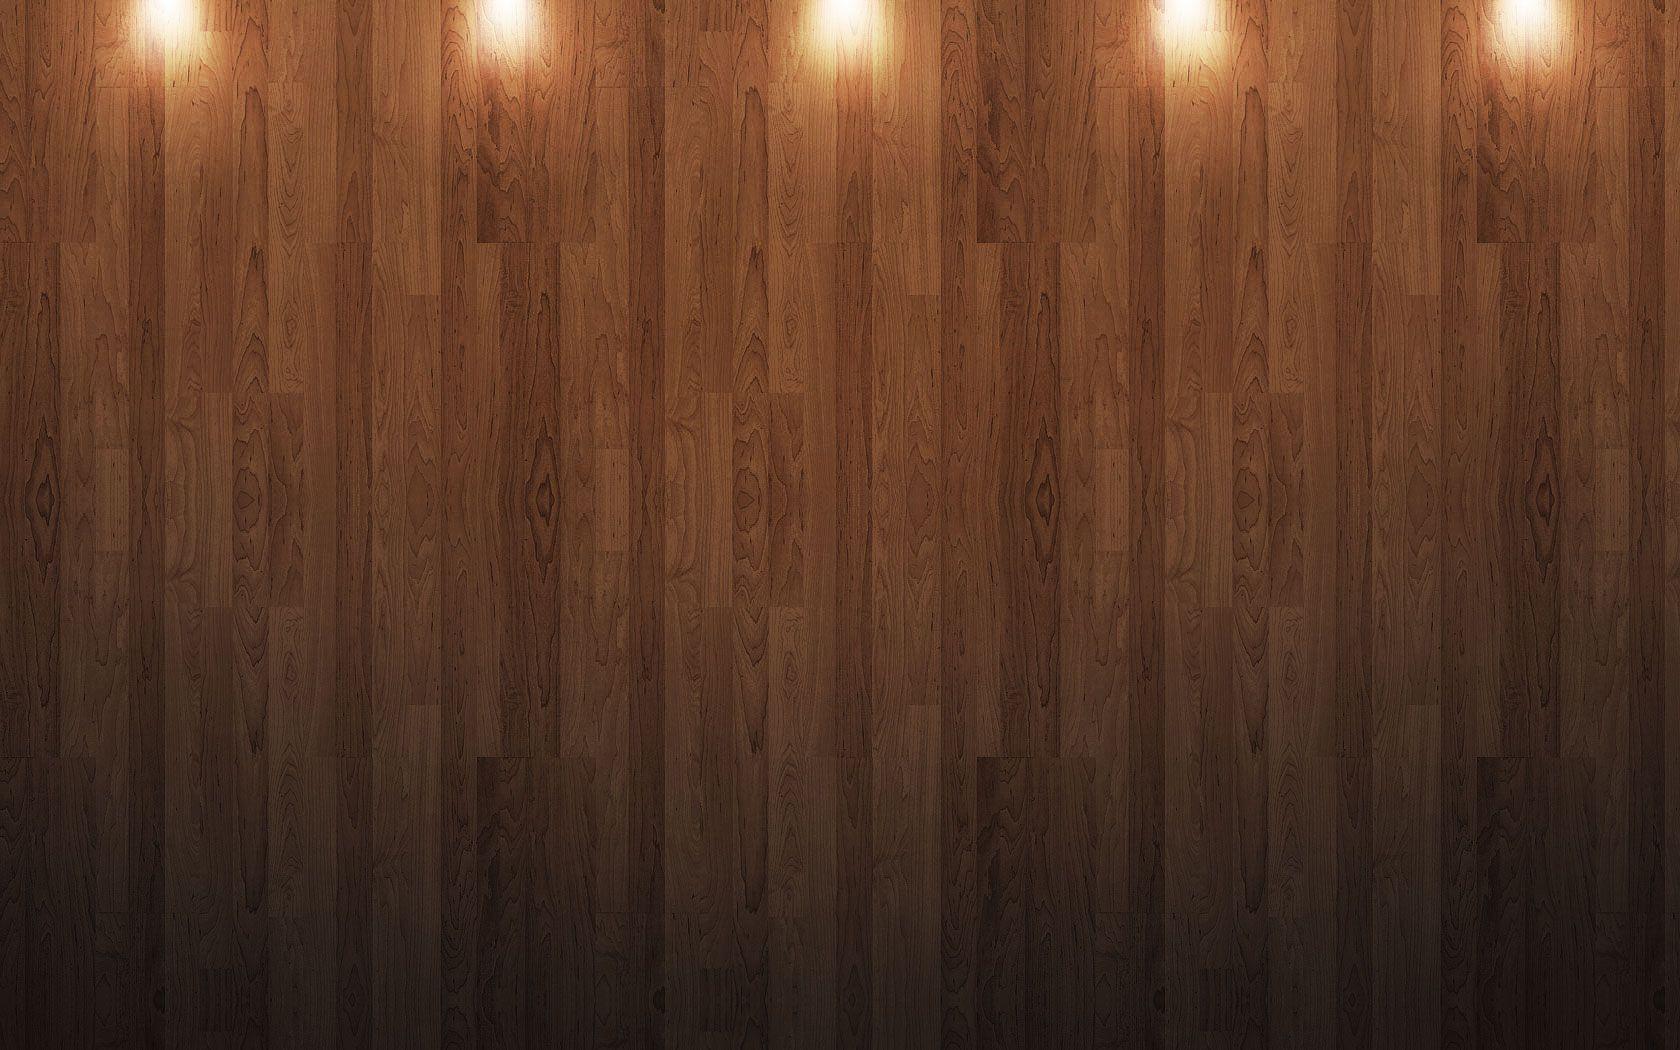 Pina Colada Pudding Shots Bartender Com Wood Wallpaper Wooden Wallpaper Hardwood